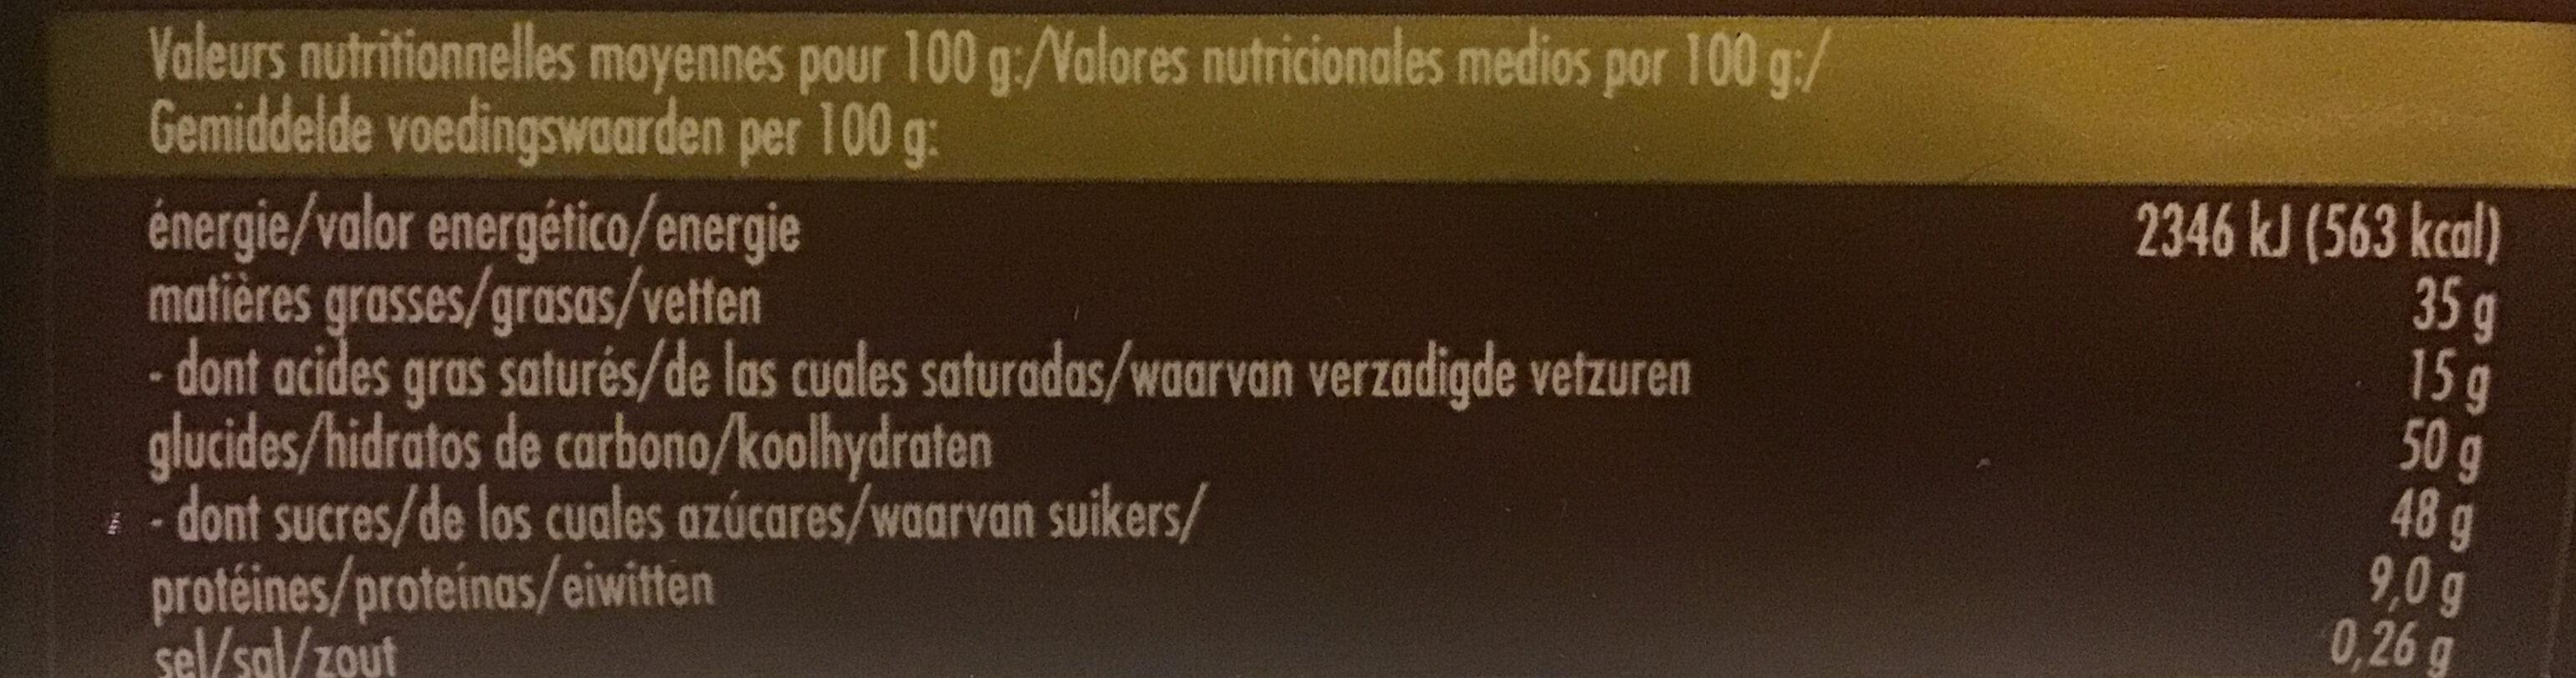 Mandorle salate e miele - Voedingswaarden - nl